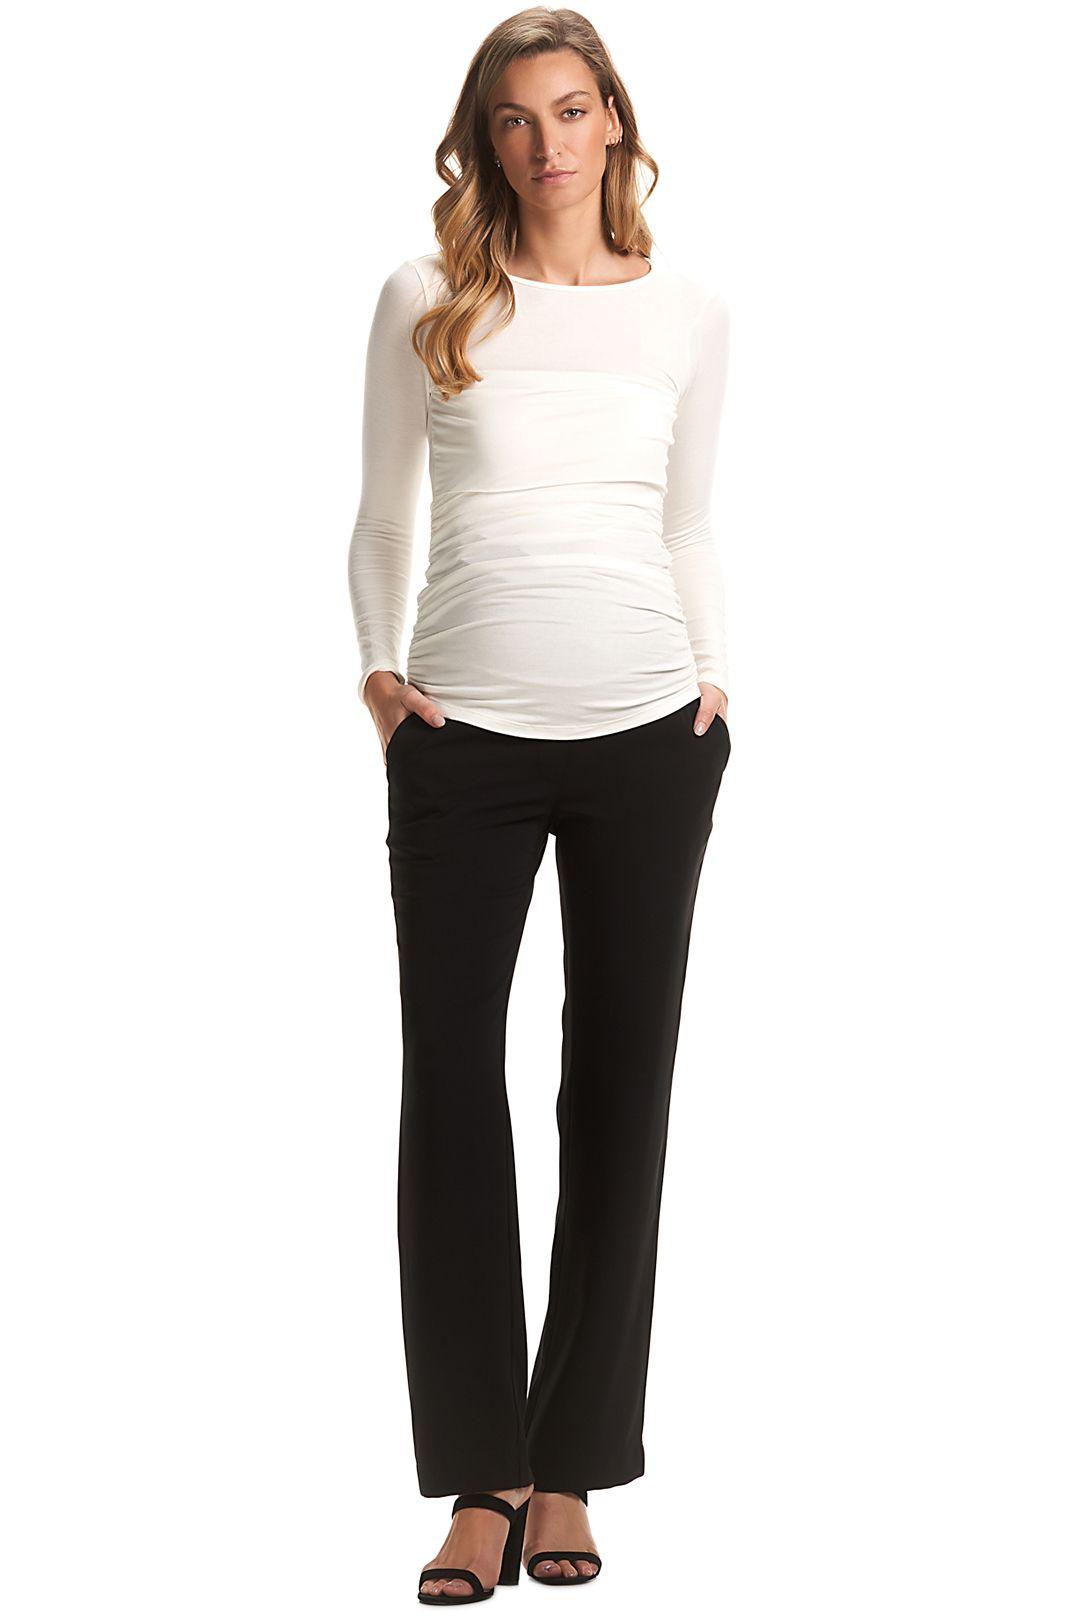 Soon-Maternity-Classic-Work-Pants-Black-Haust-Front